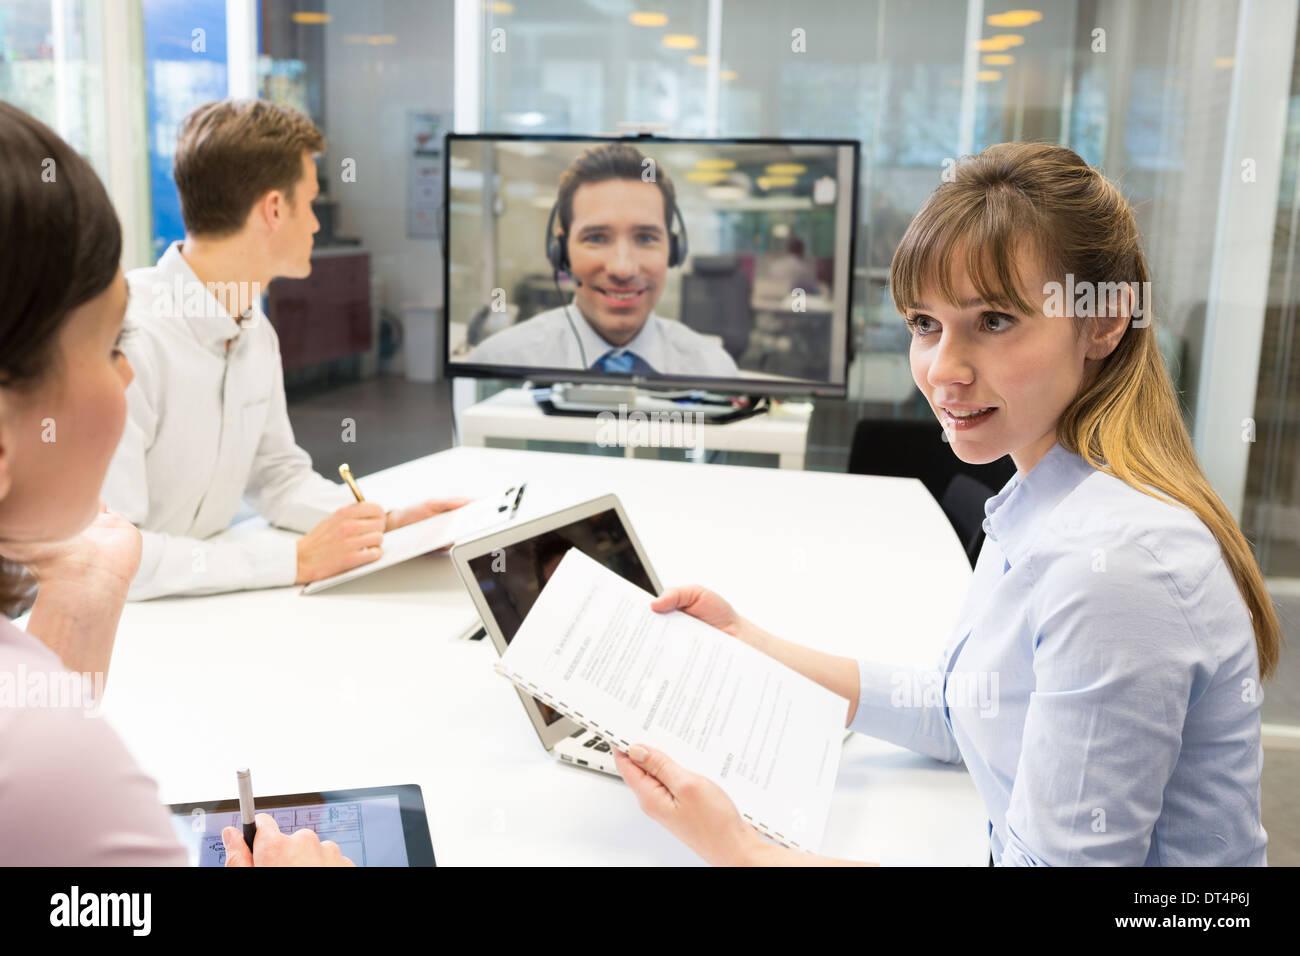 Businesswoman businessman desk chat colleagues - Stock Image